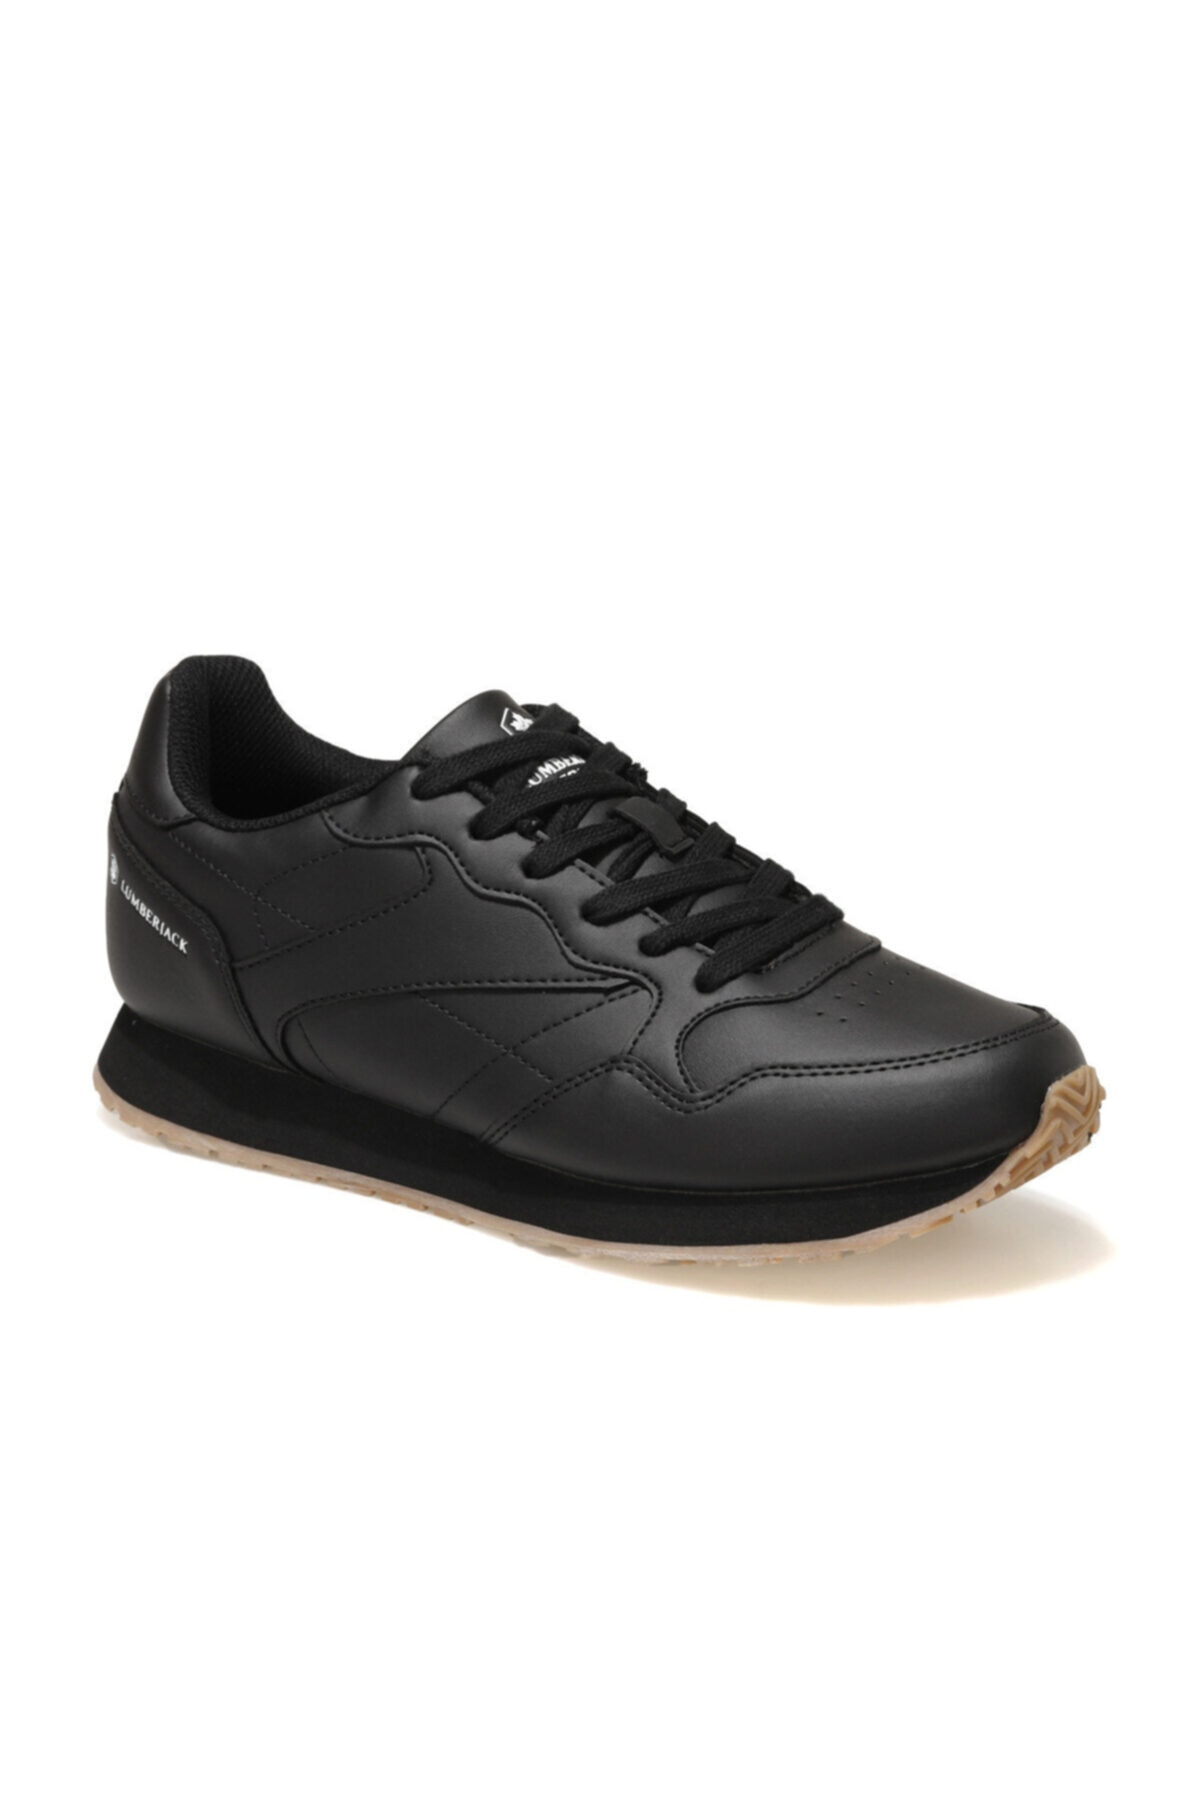 HELLO 1FX Siyah Erkek Sneaker Ayakkabı 100785244